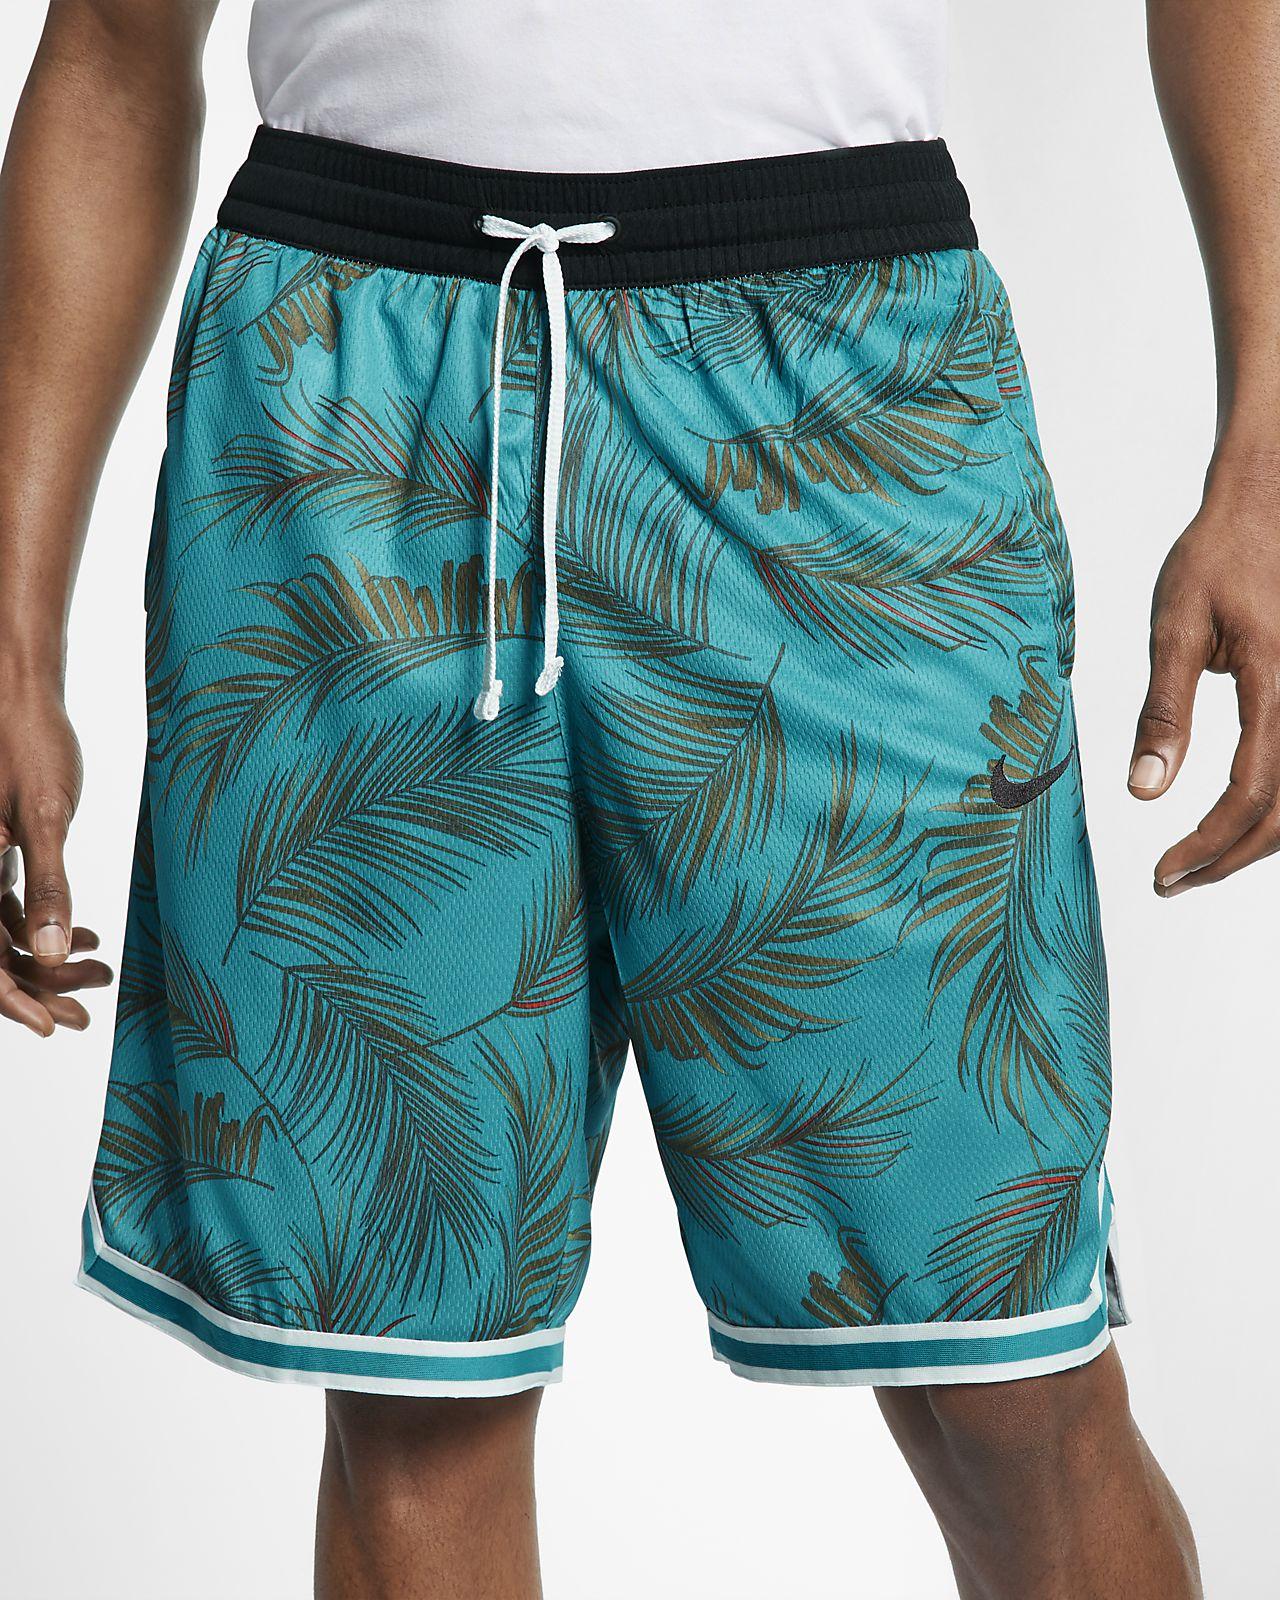 185f31694b2f Nike Dri-FIT DNA Men s Basketball Shorts. Nike.com BE